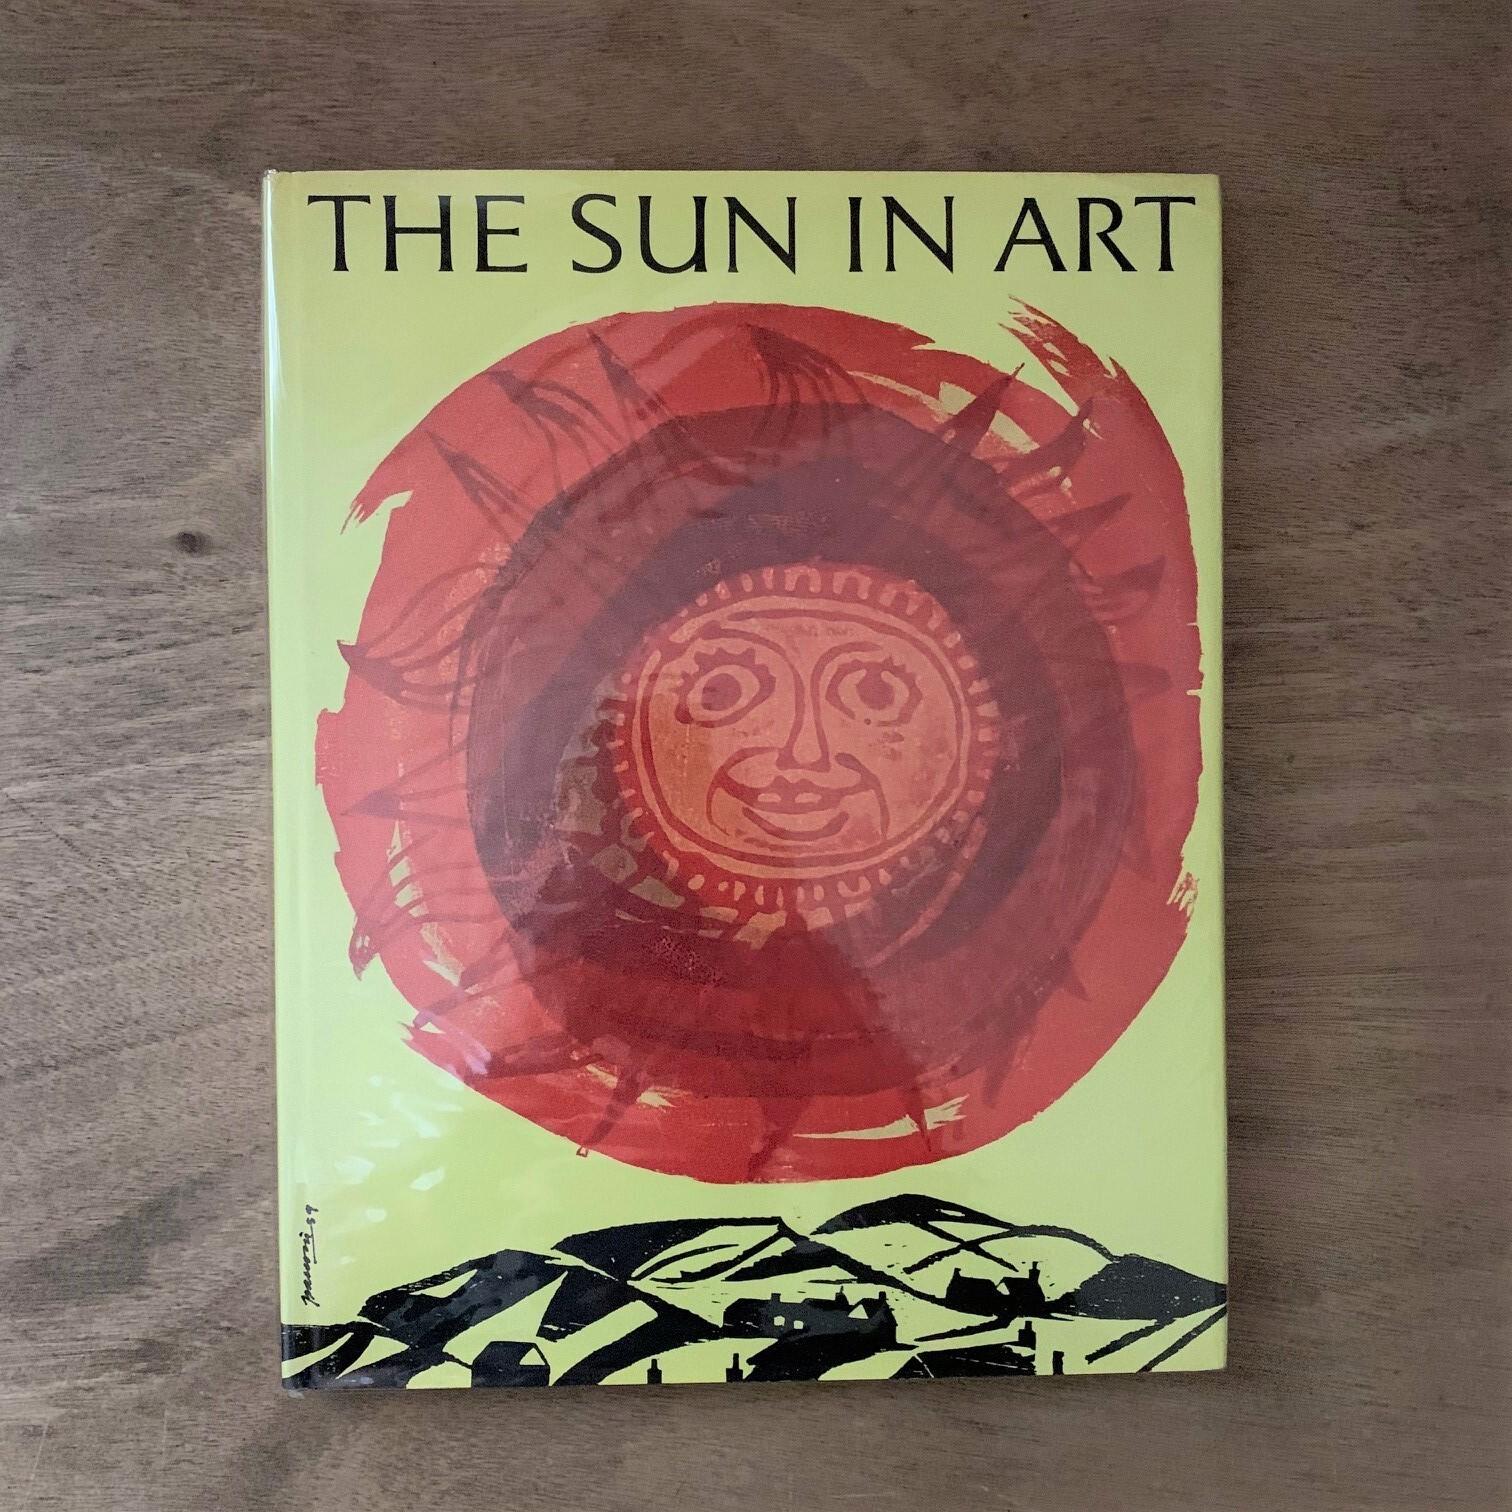 THE SUN IN ART / Walter Herdeg / GRAPHIS PRESS 1962